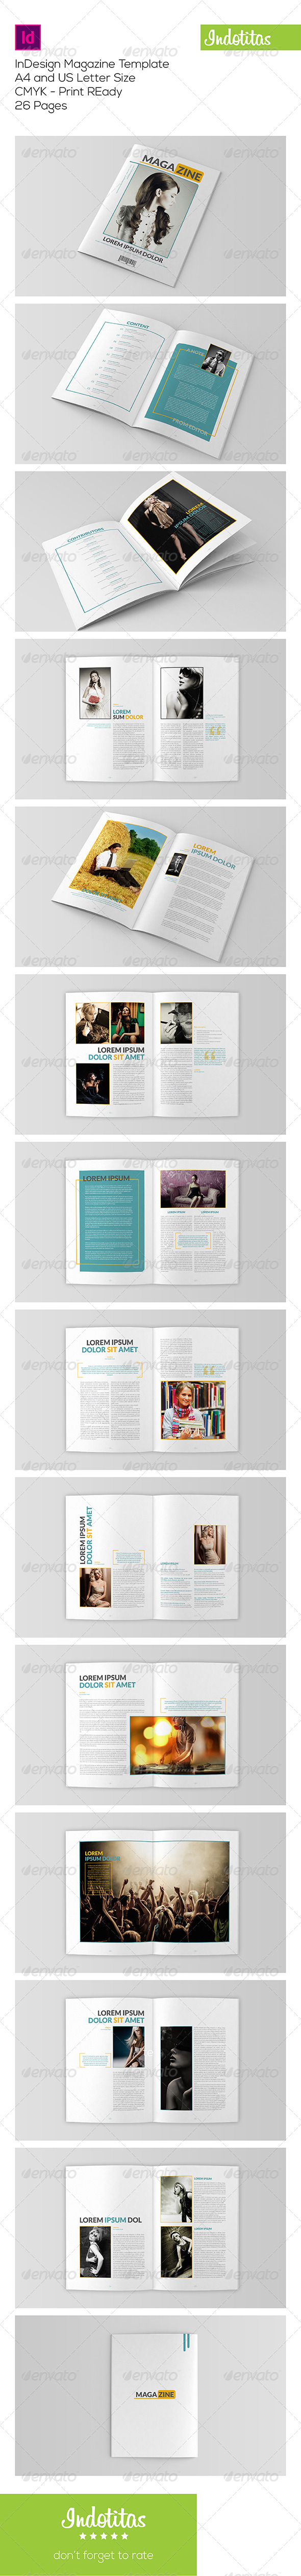 GraphicRiver InDesign Magazine Template 7767842